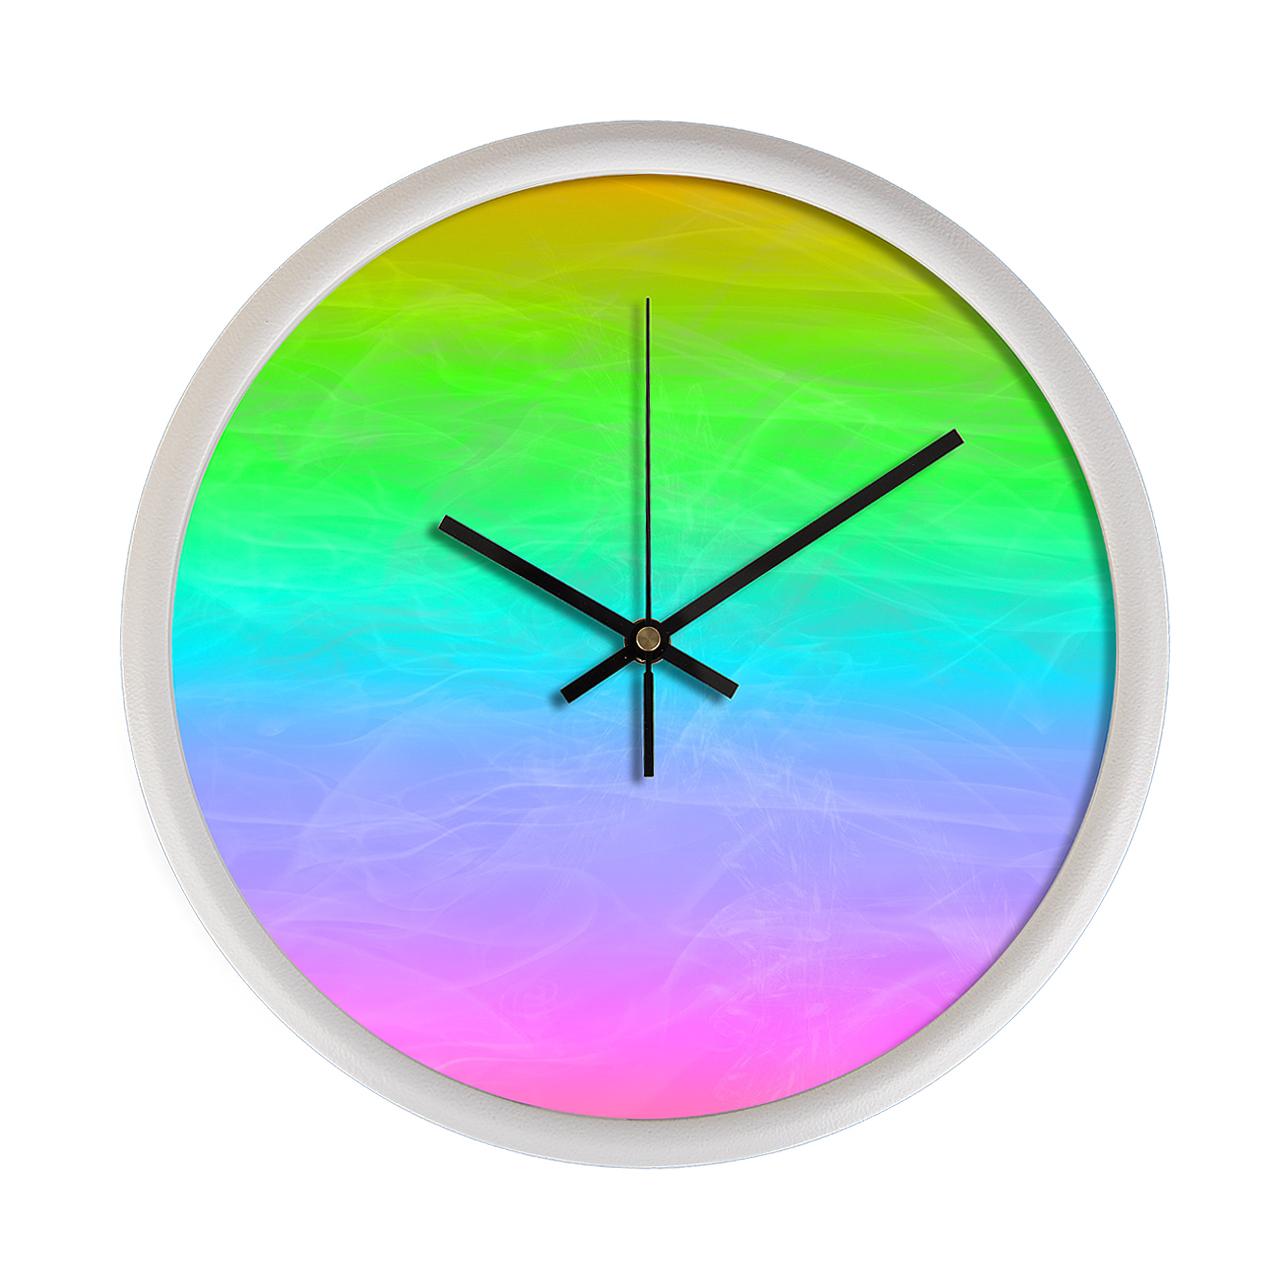 ساعت دیواری مینی مال لاکچری مدل 35Dio3_0003